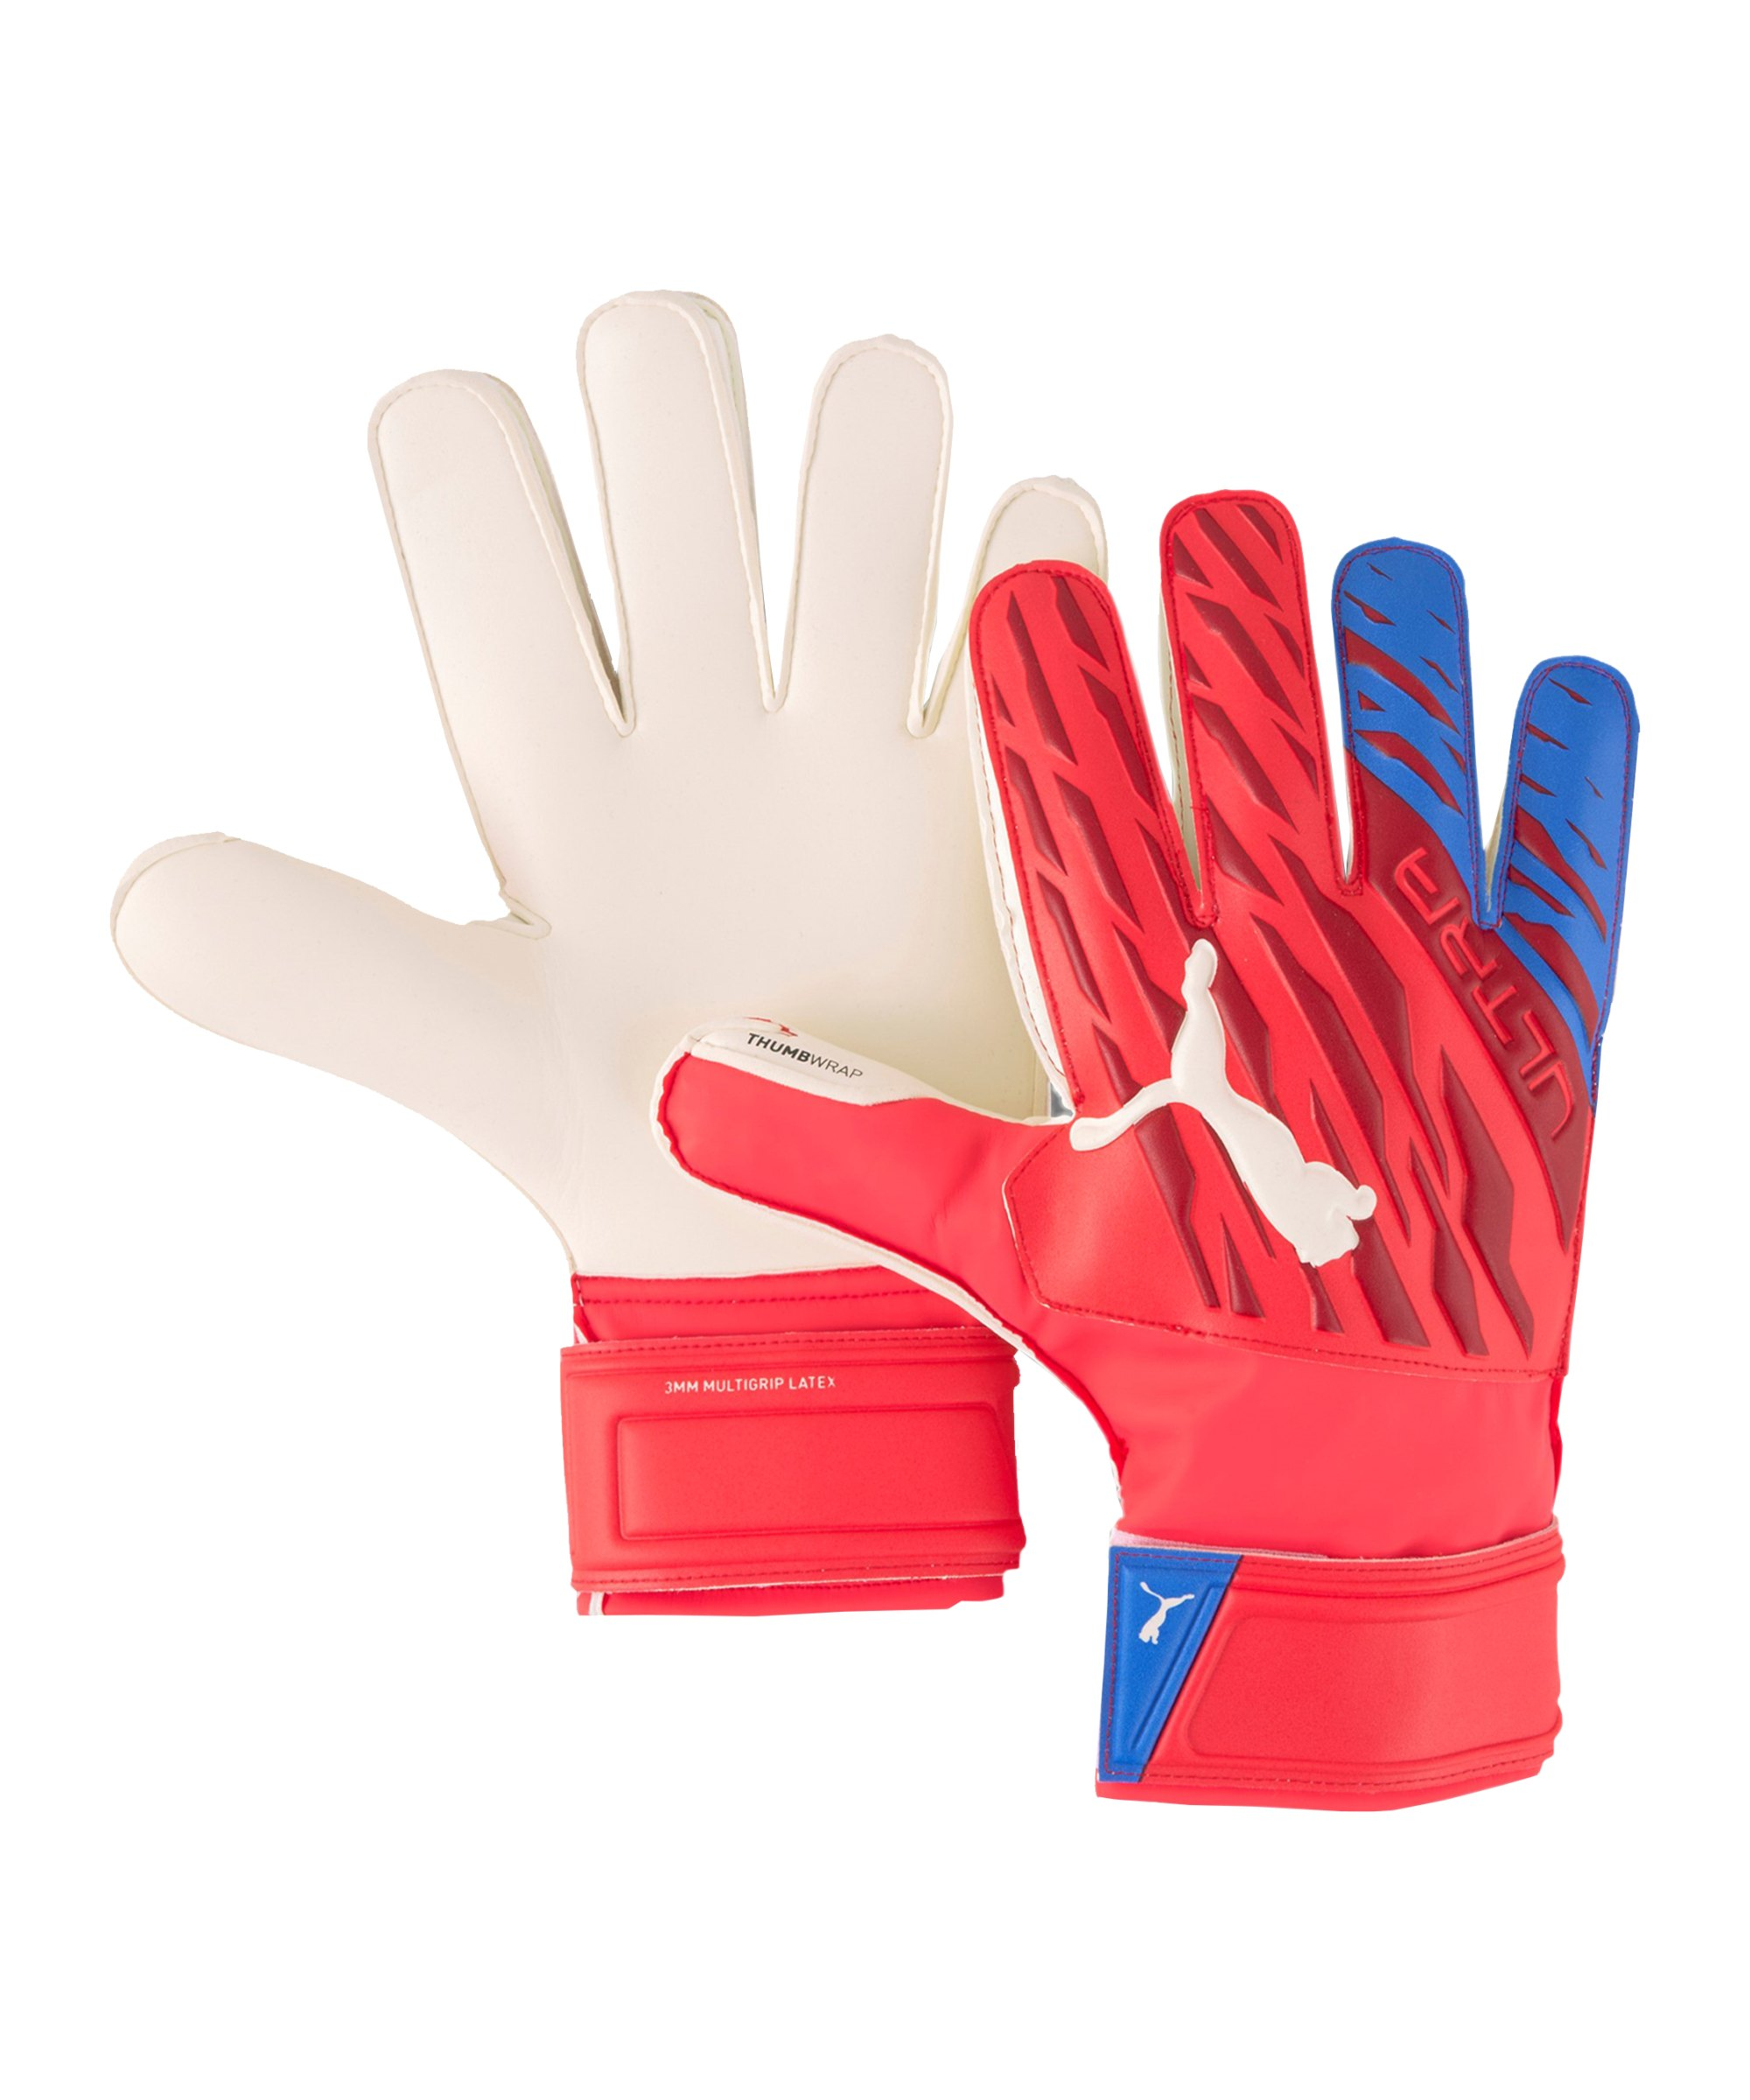 PUMA ULTRA Protect 3 RC Faster Football Torwarthandschuh Rot F01 - rot